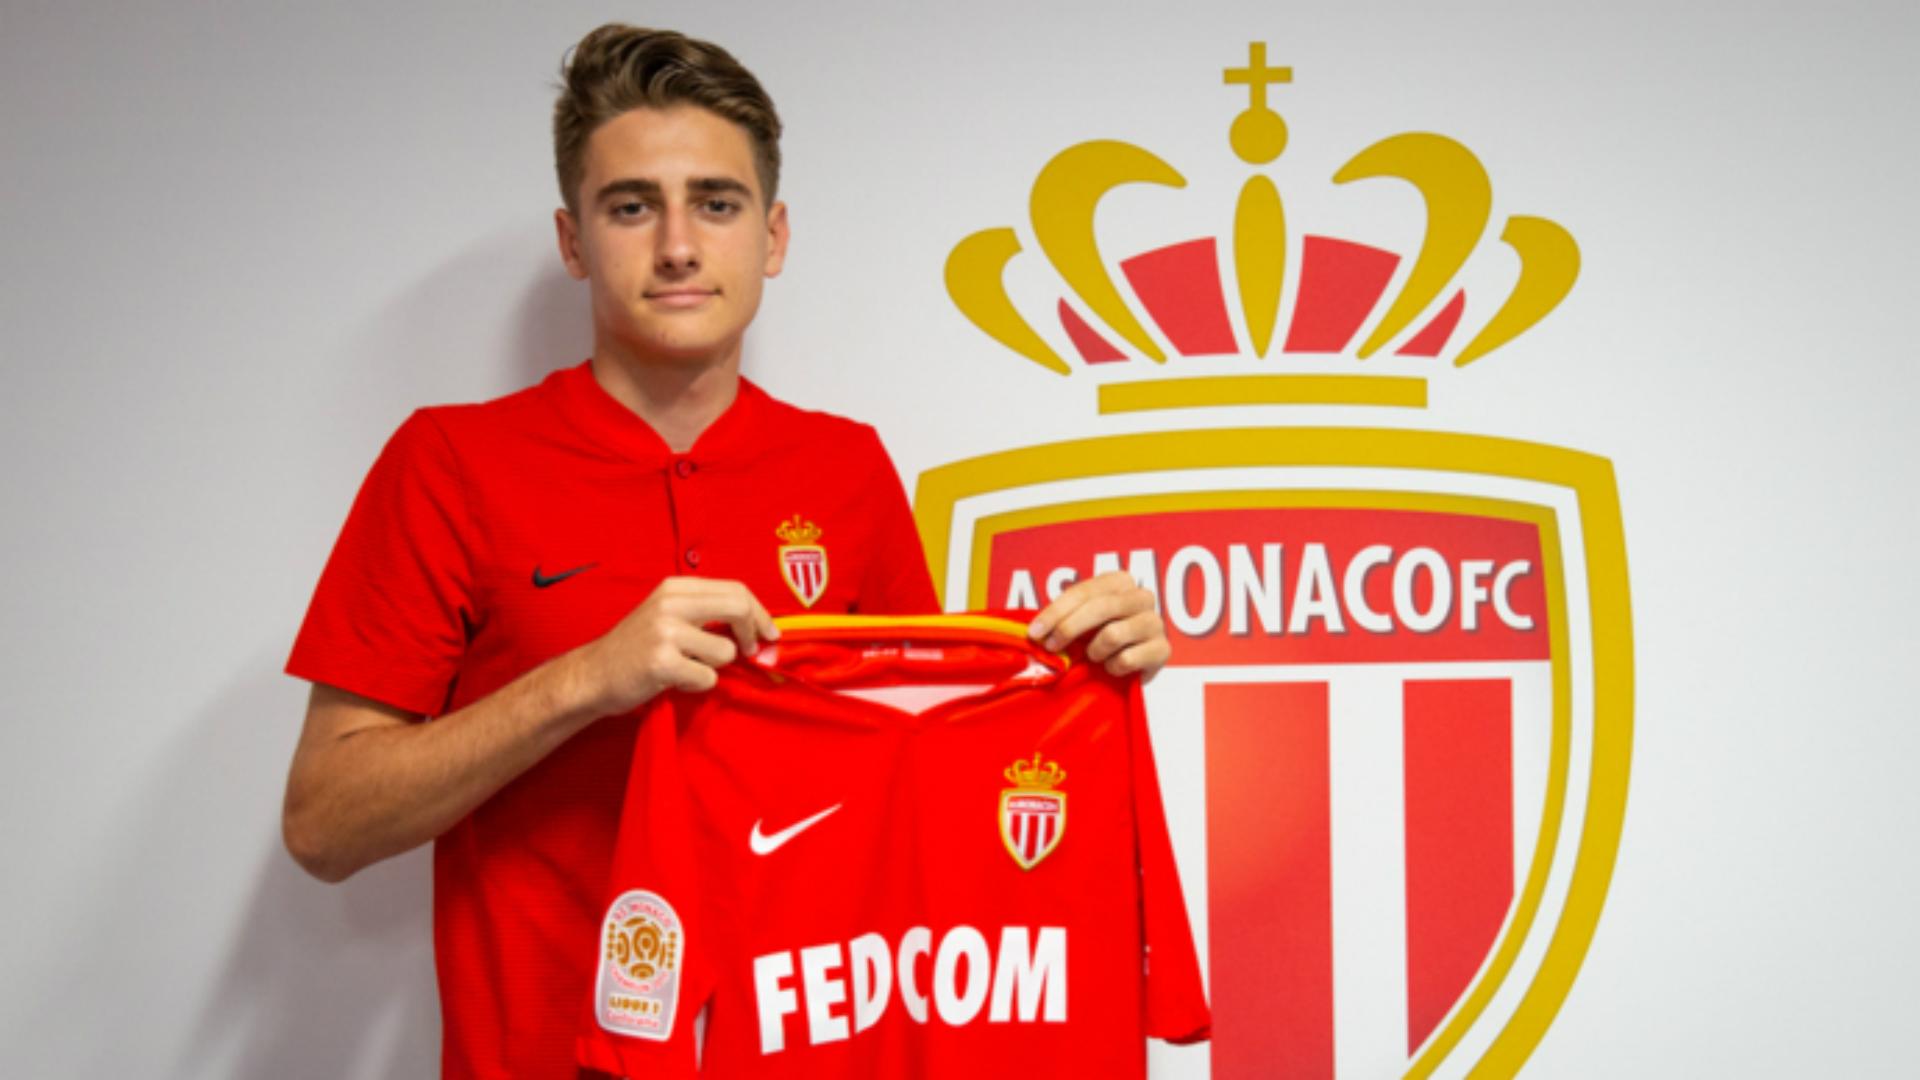 Monaco complete €20m move for Lyon teenager Geubbels